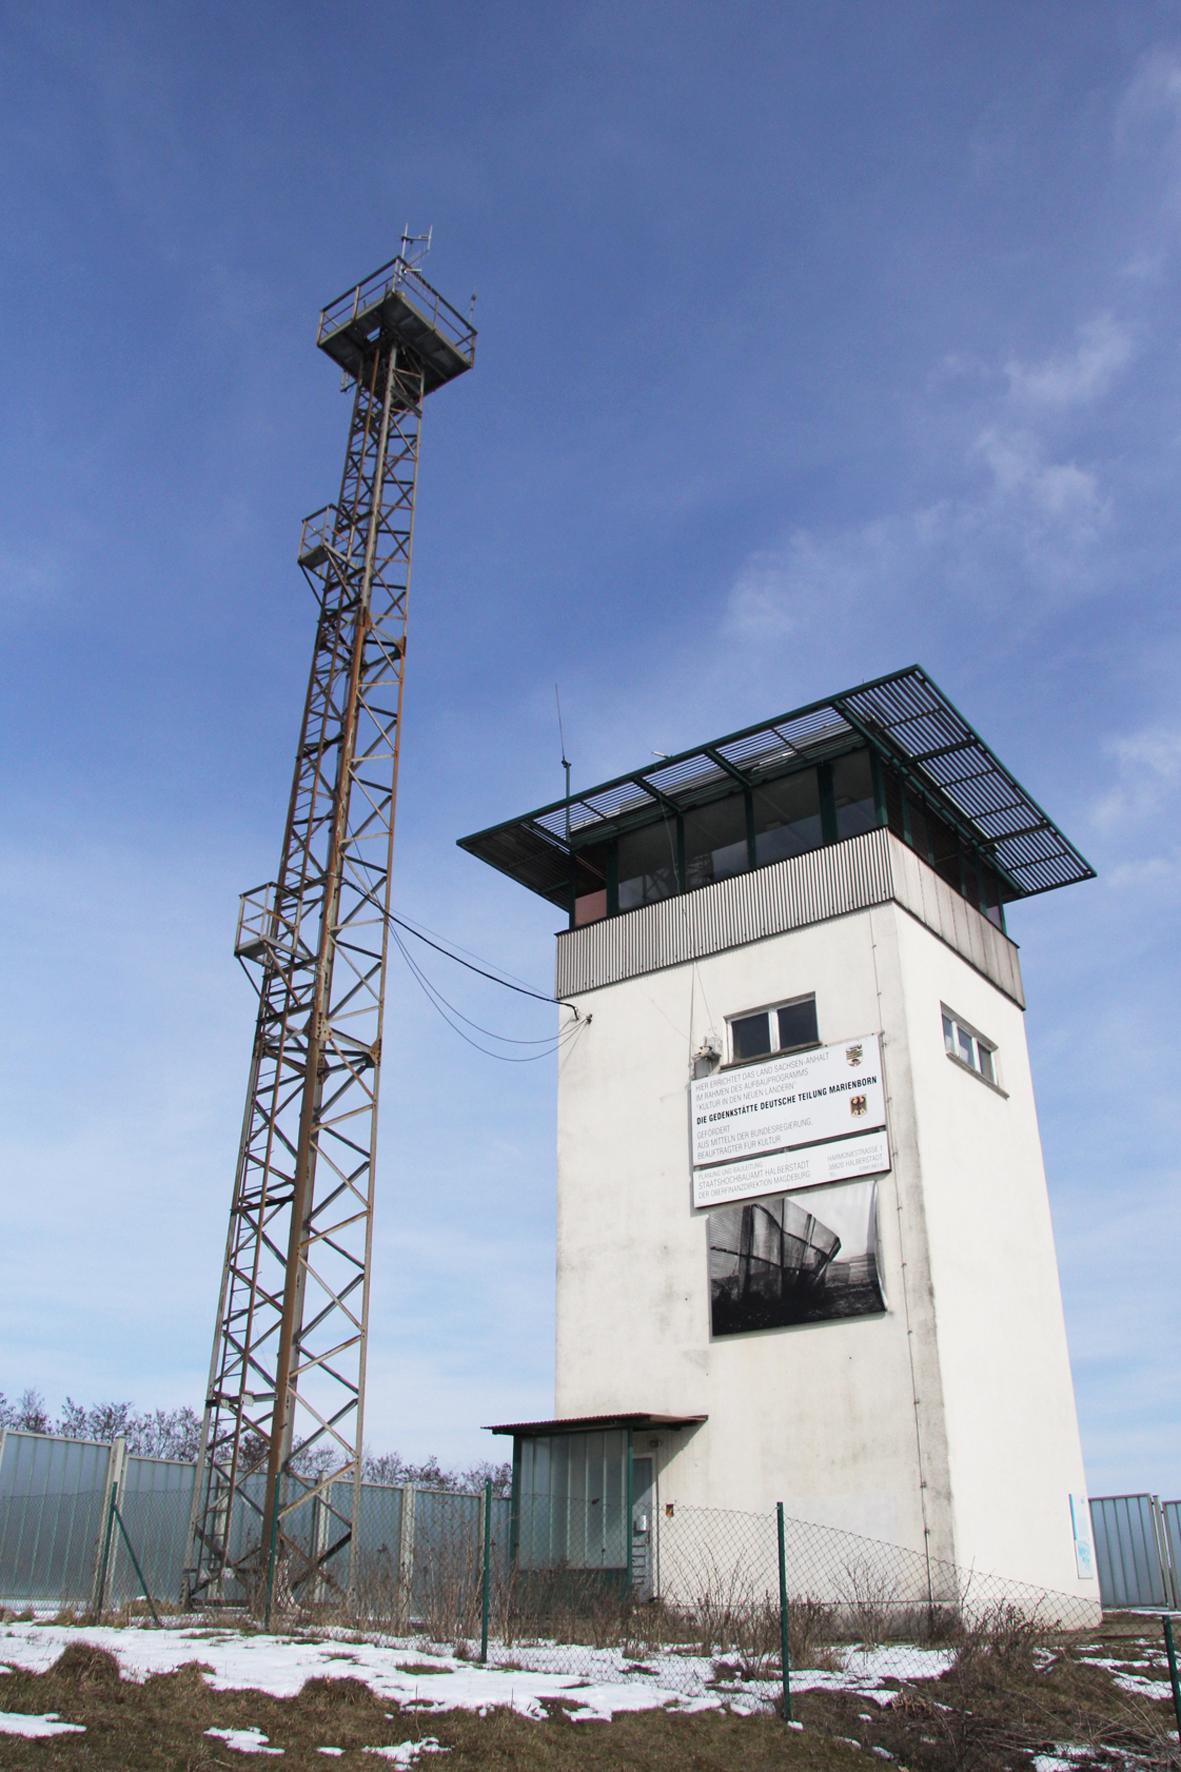 Wachturm an der Gedenkstätte Deutsche Teilung Marienborn am Checkpoint Alpha